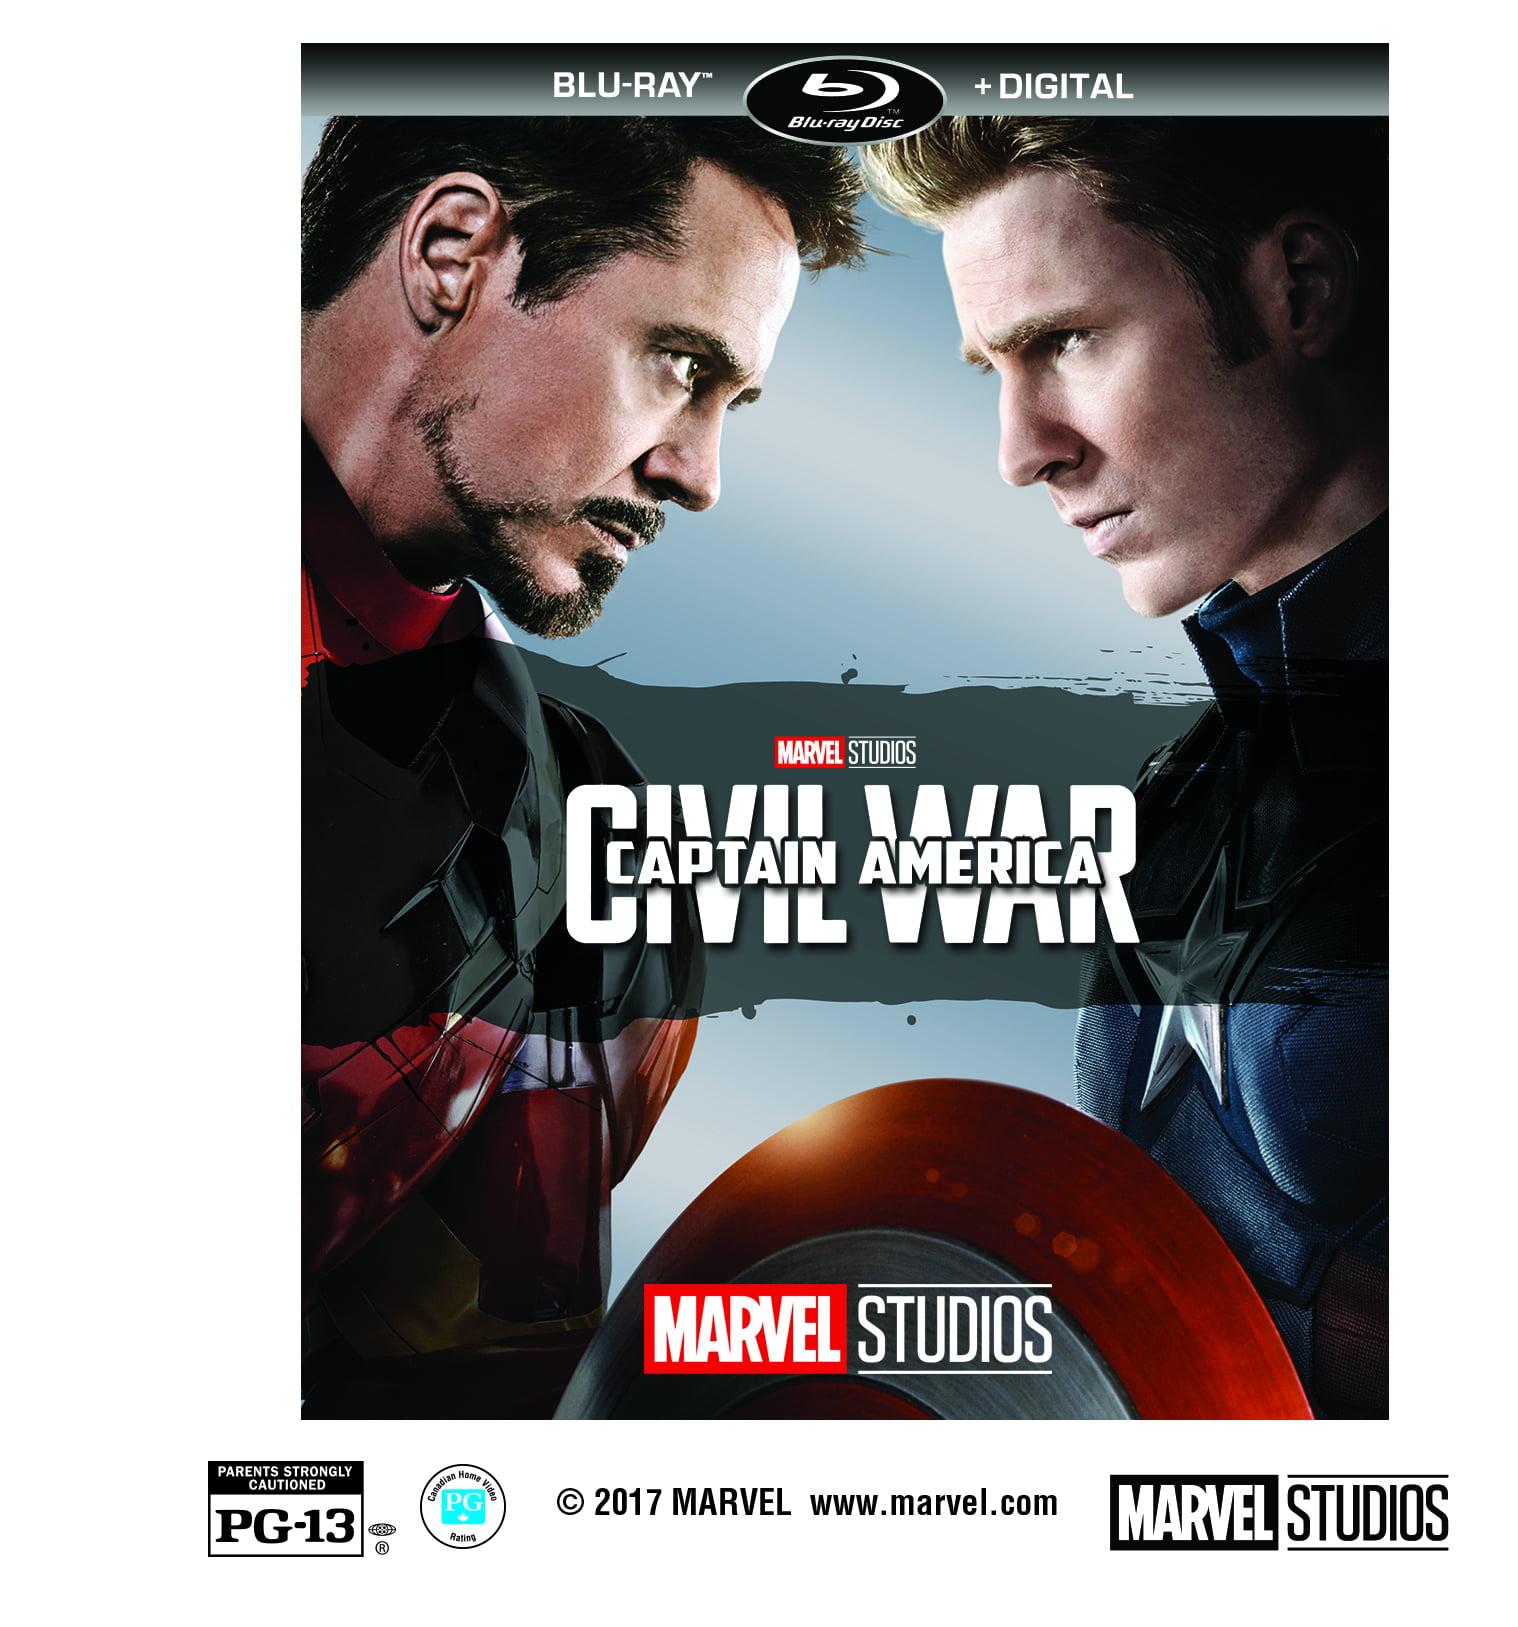 Captain America: Civil War (Blu-ray + Digital) by